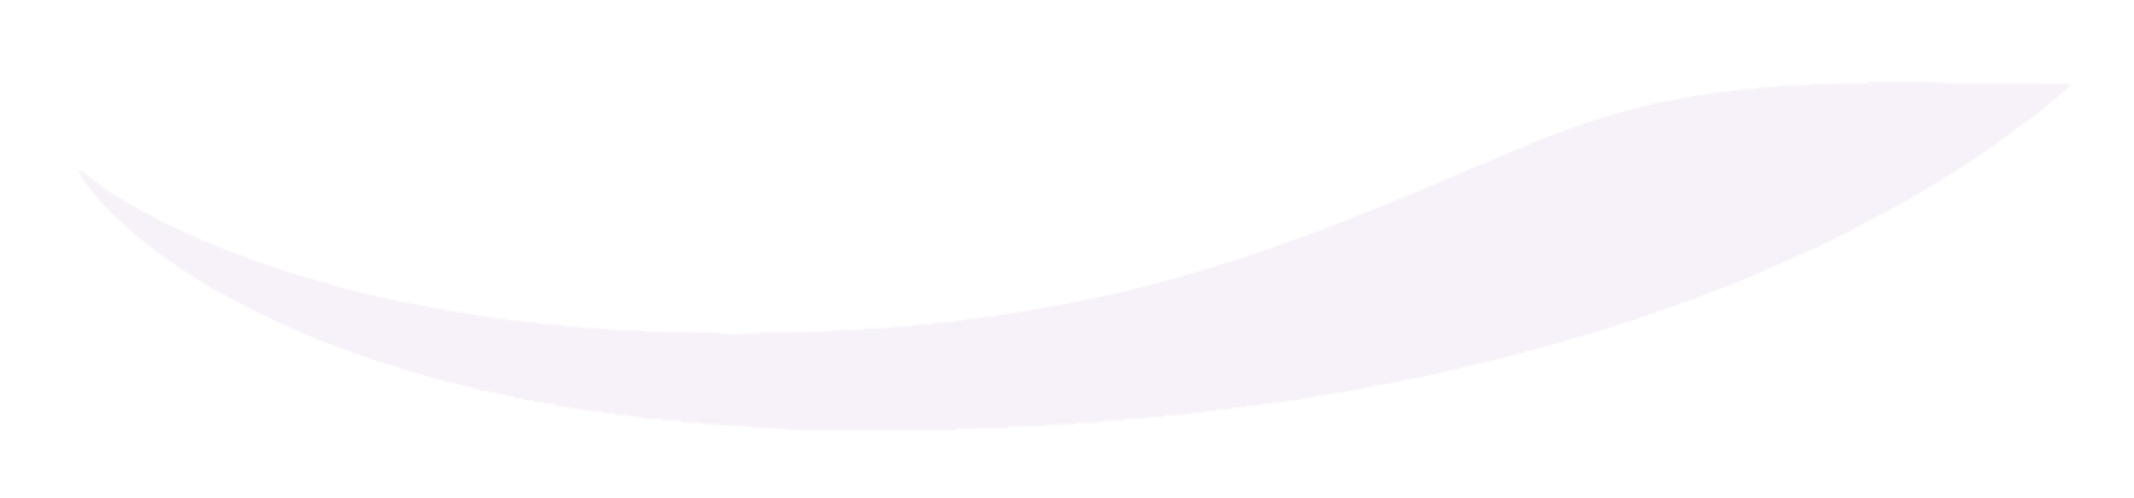 logo-symbol-large@2x